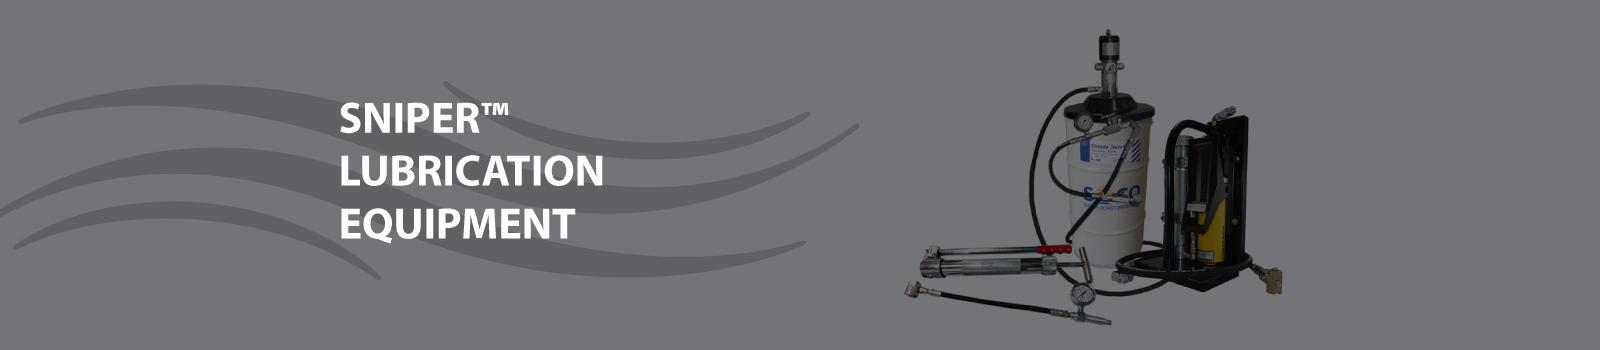 sniper lubrication equipment banner